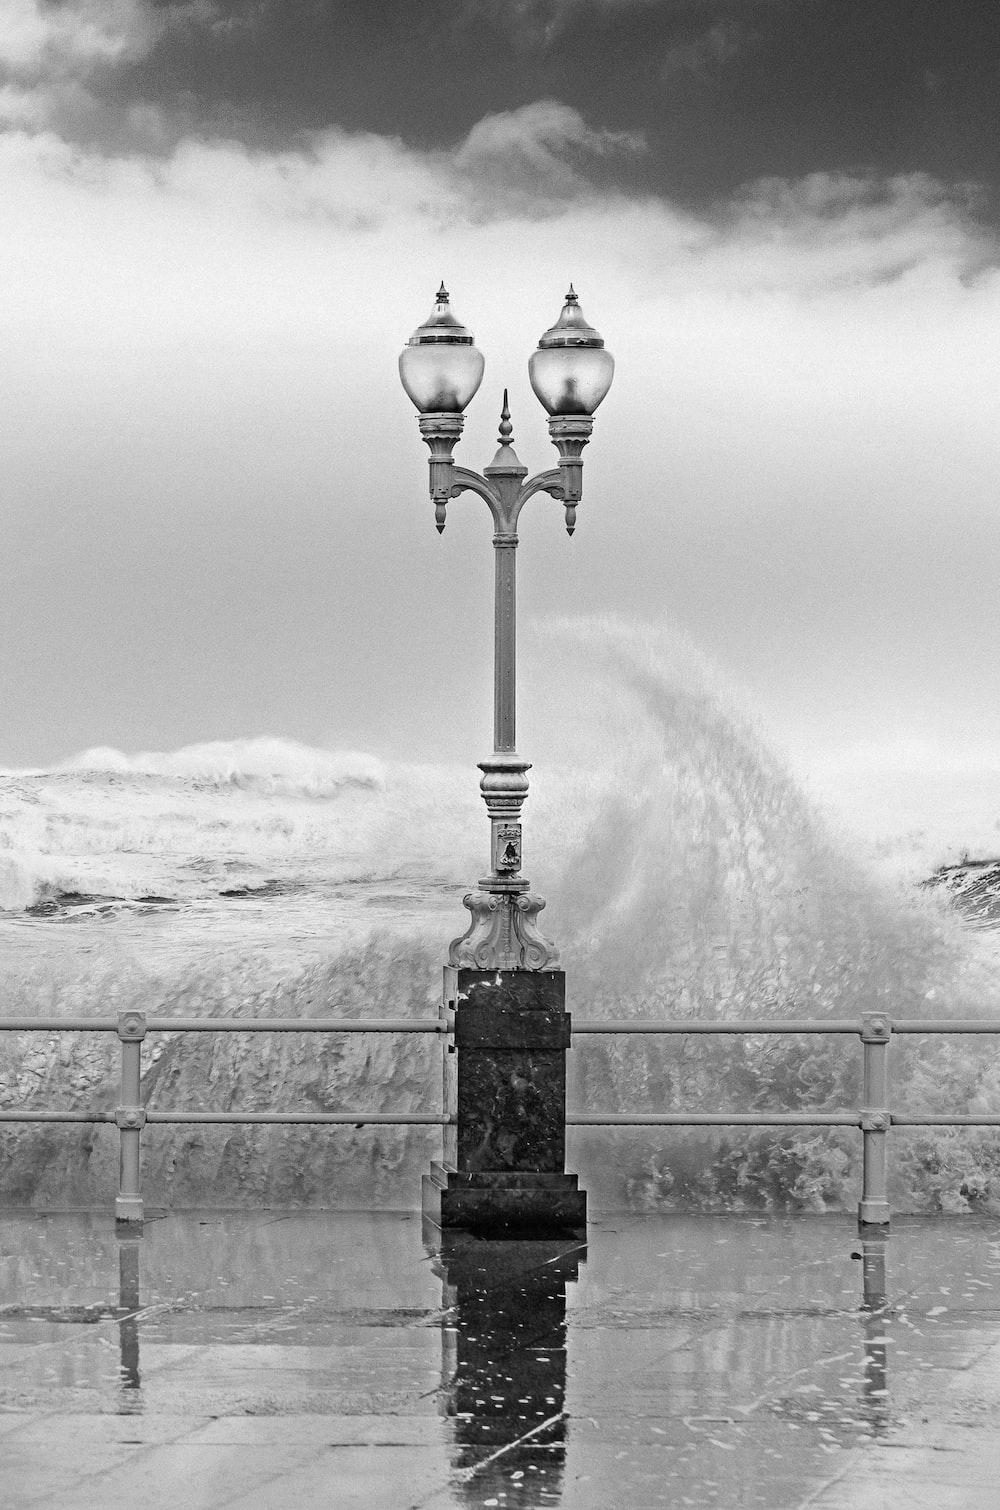 grayscale photo of streetlight